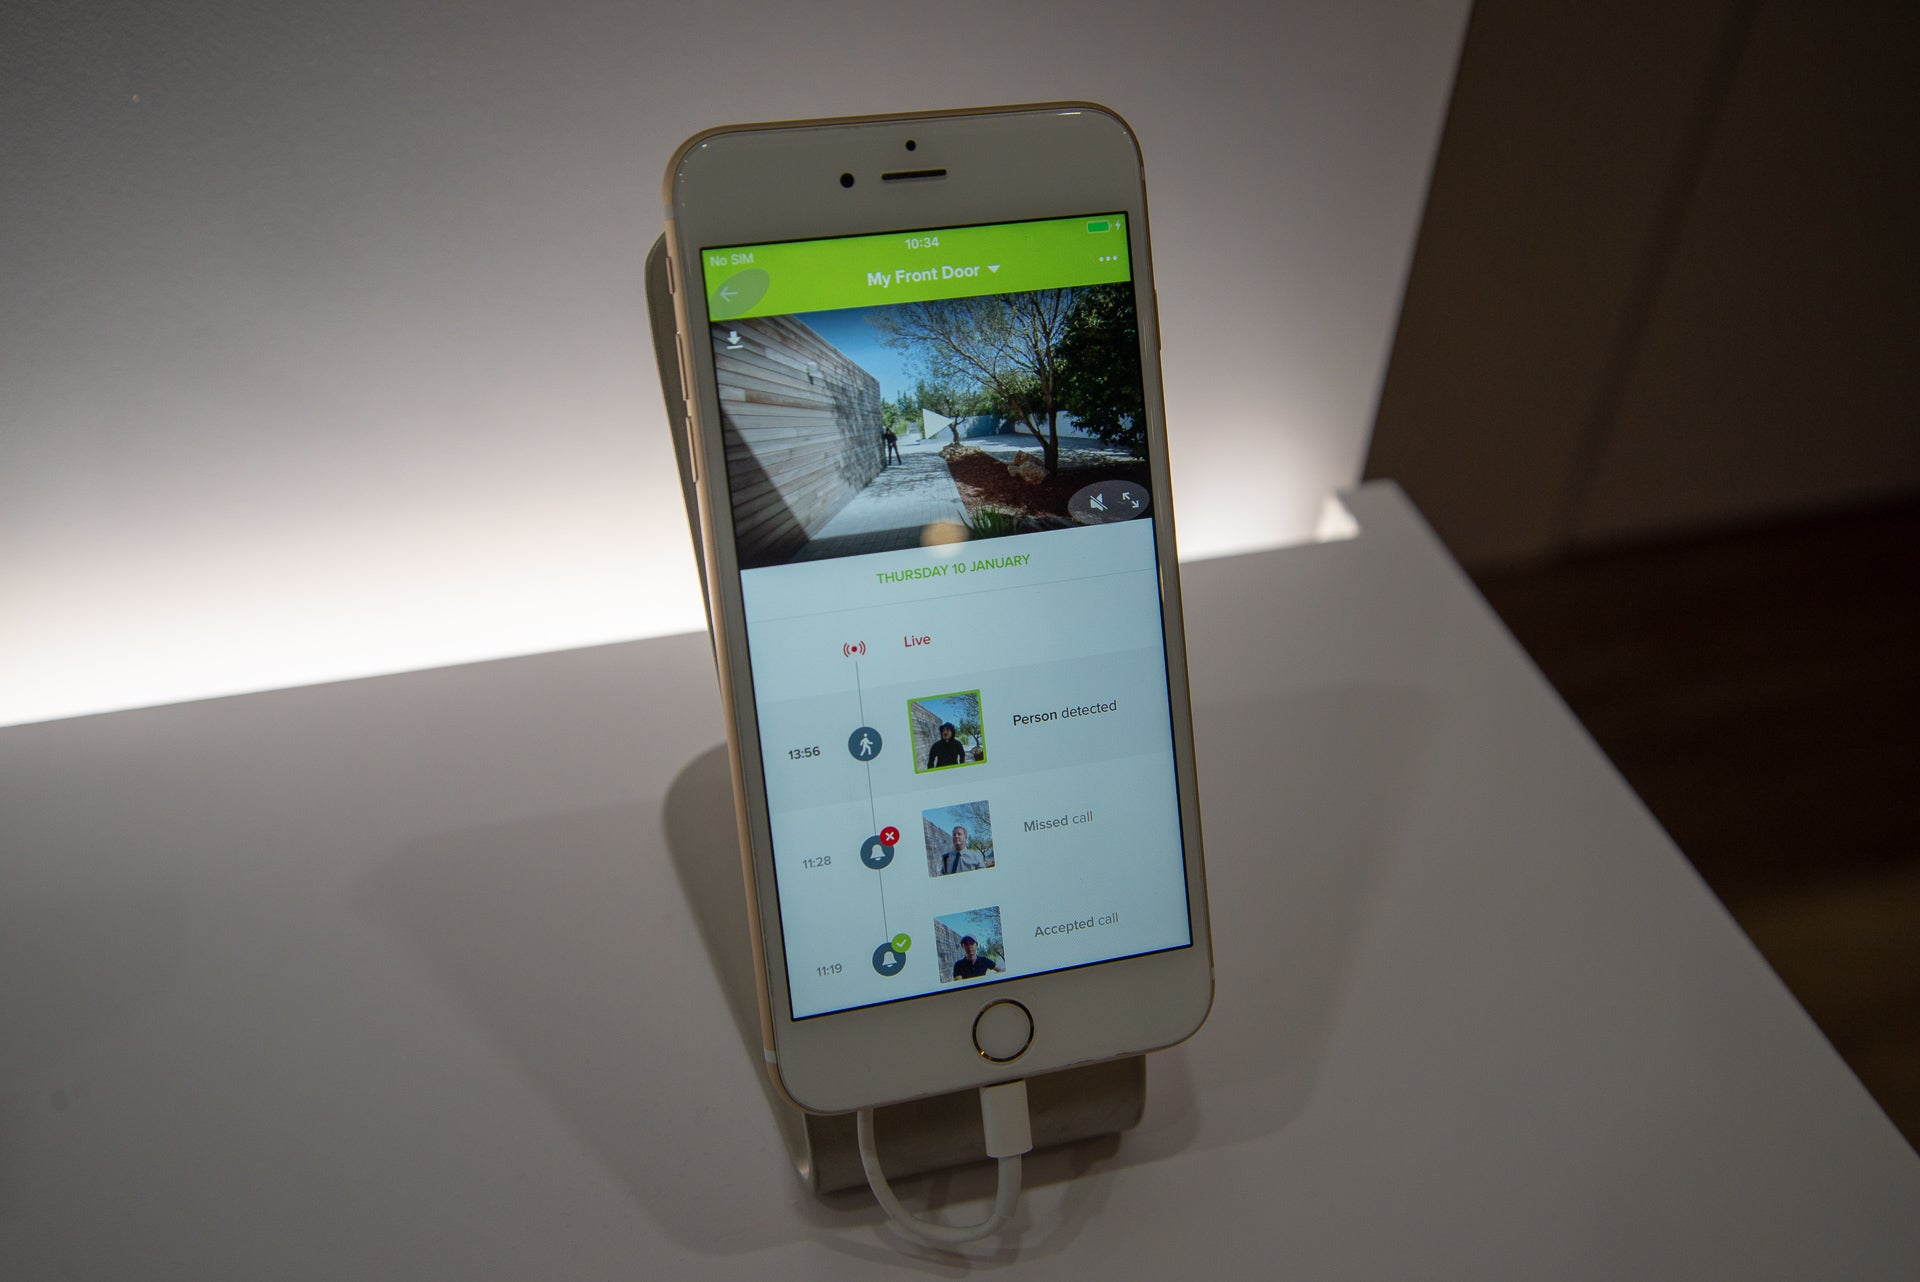 Netatmo Smart Video Doorbell first look: Subscription-free